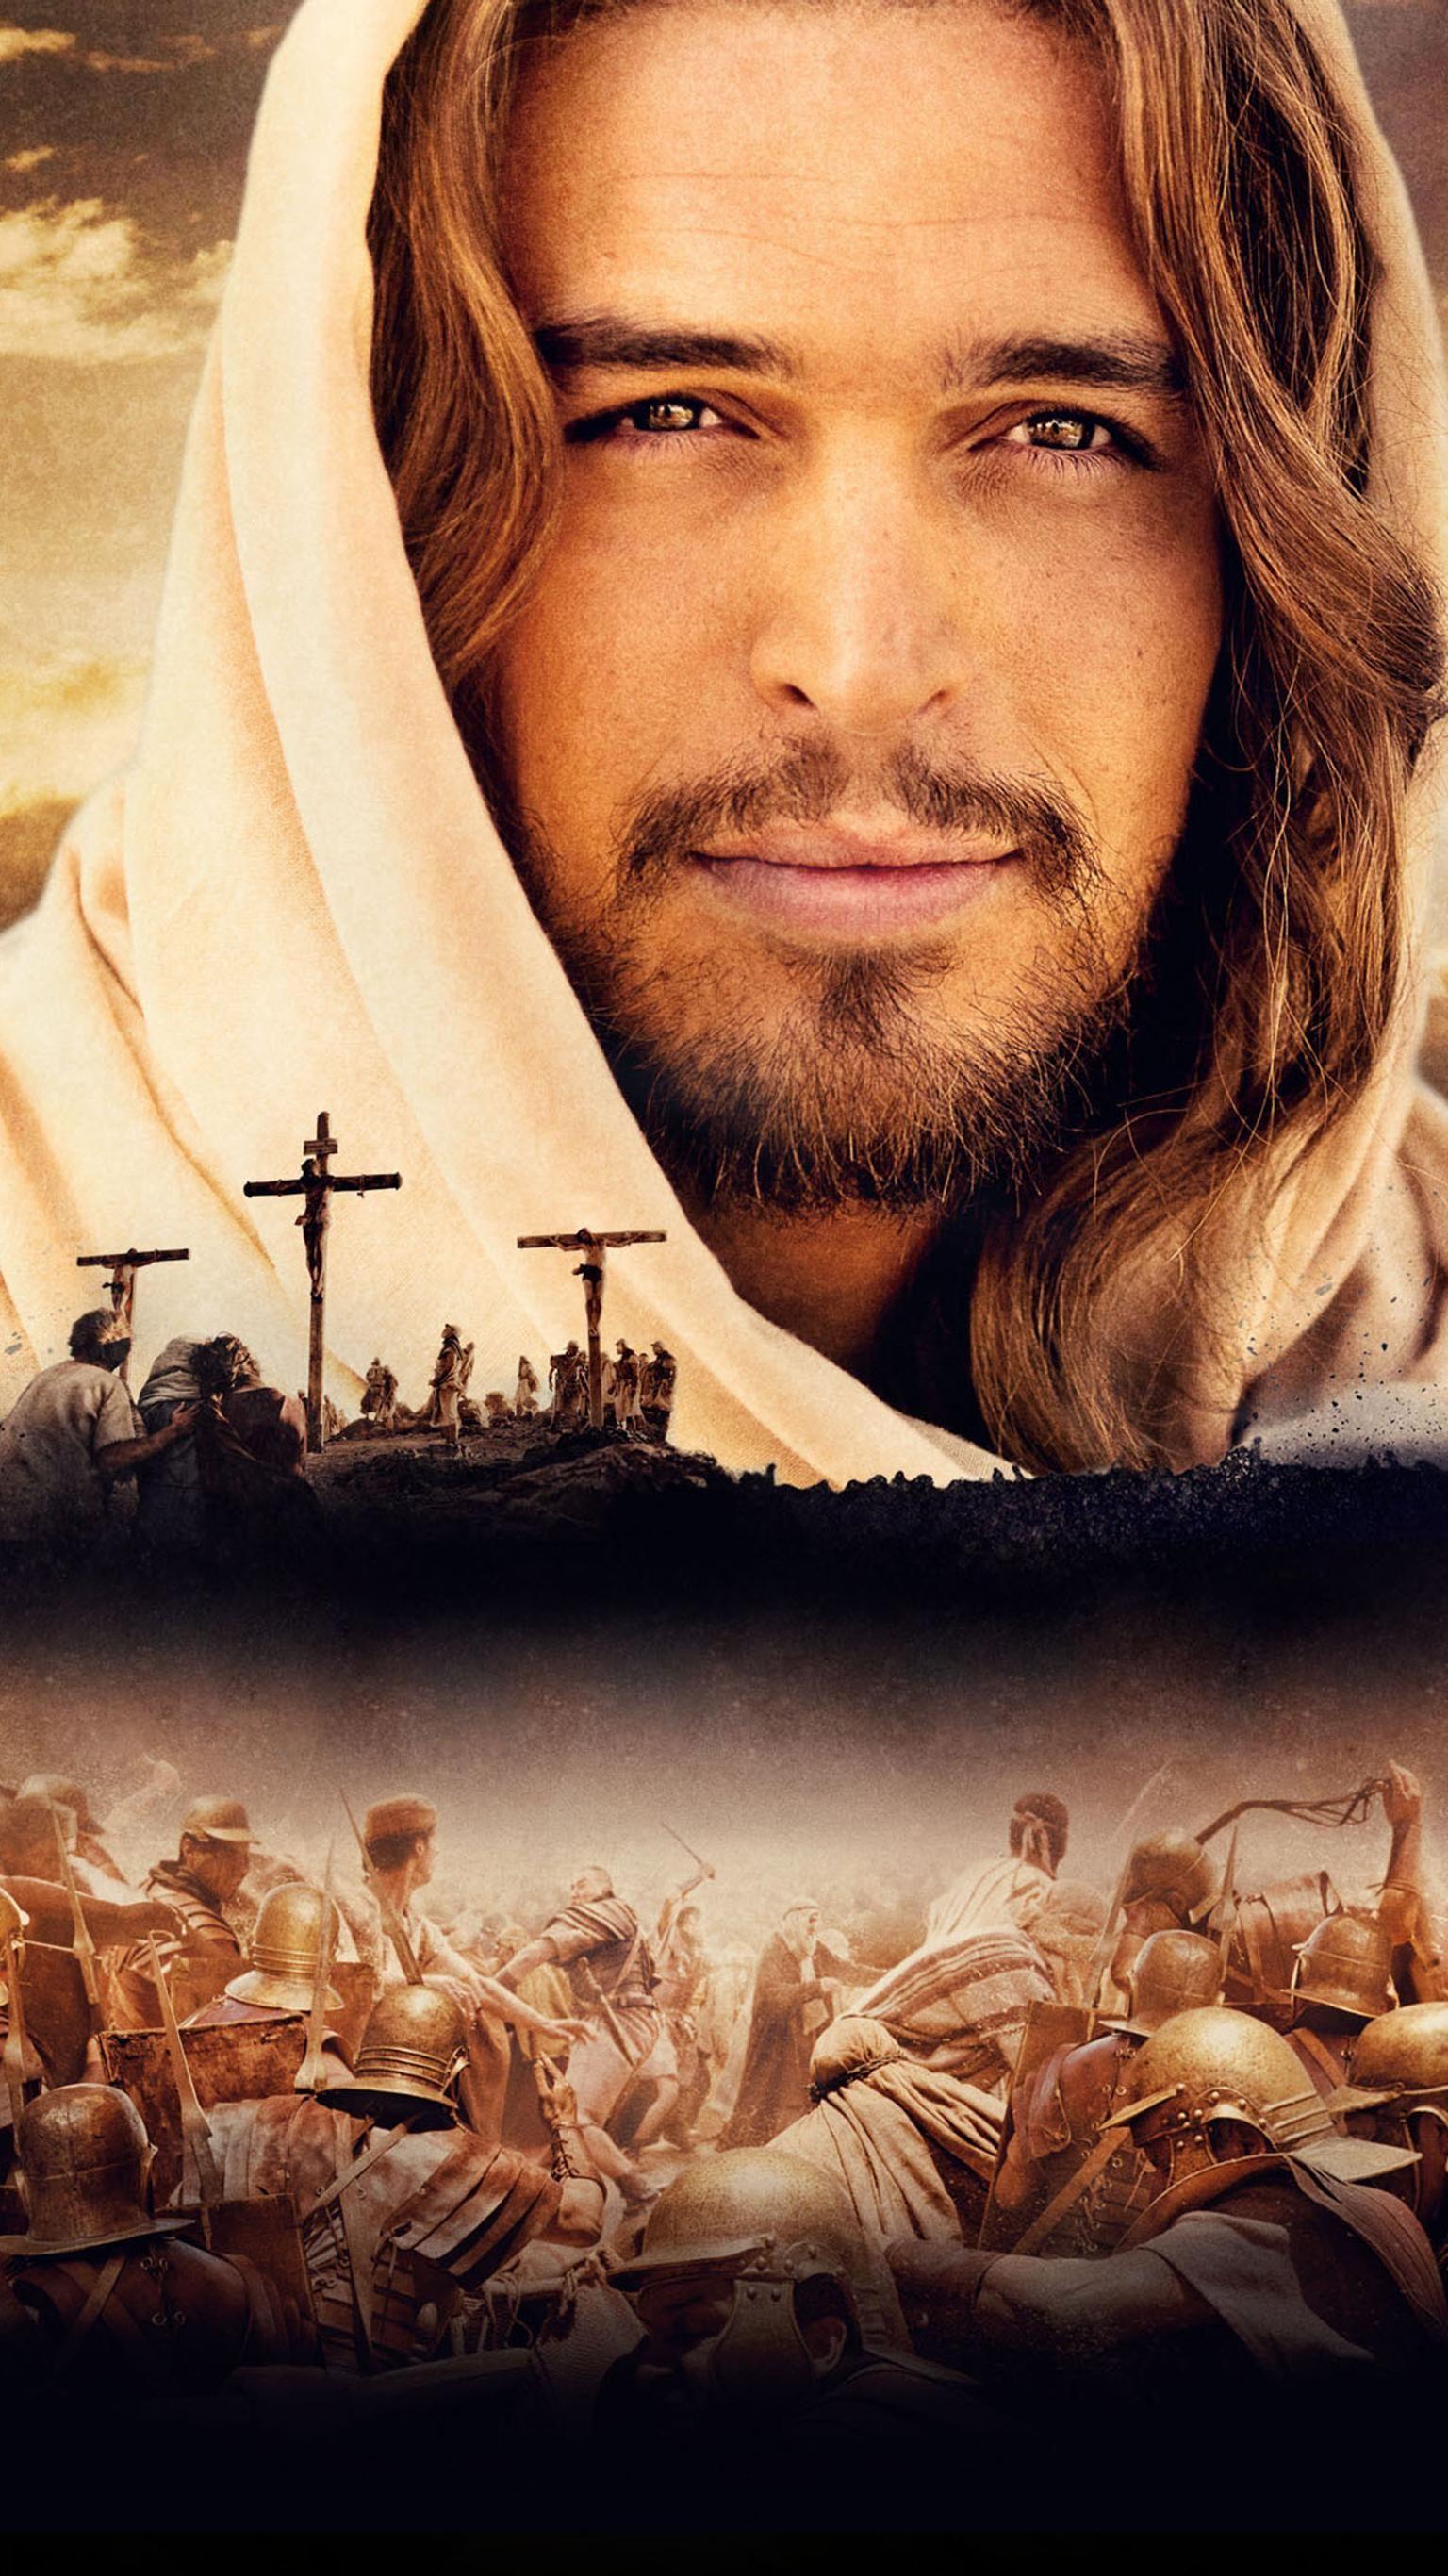 Pin By Priscilla On Jesus Christ Jesus Images Son Of God Jesus